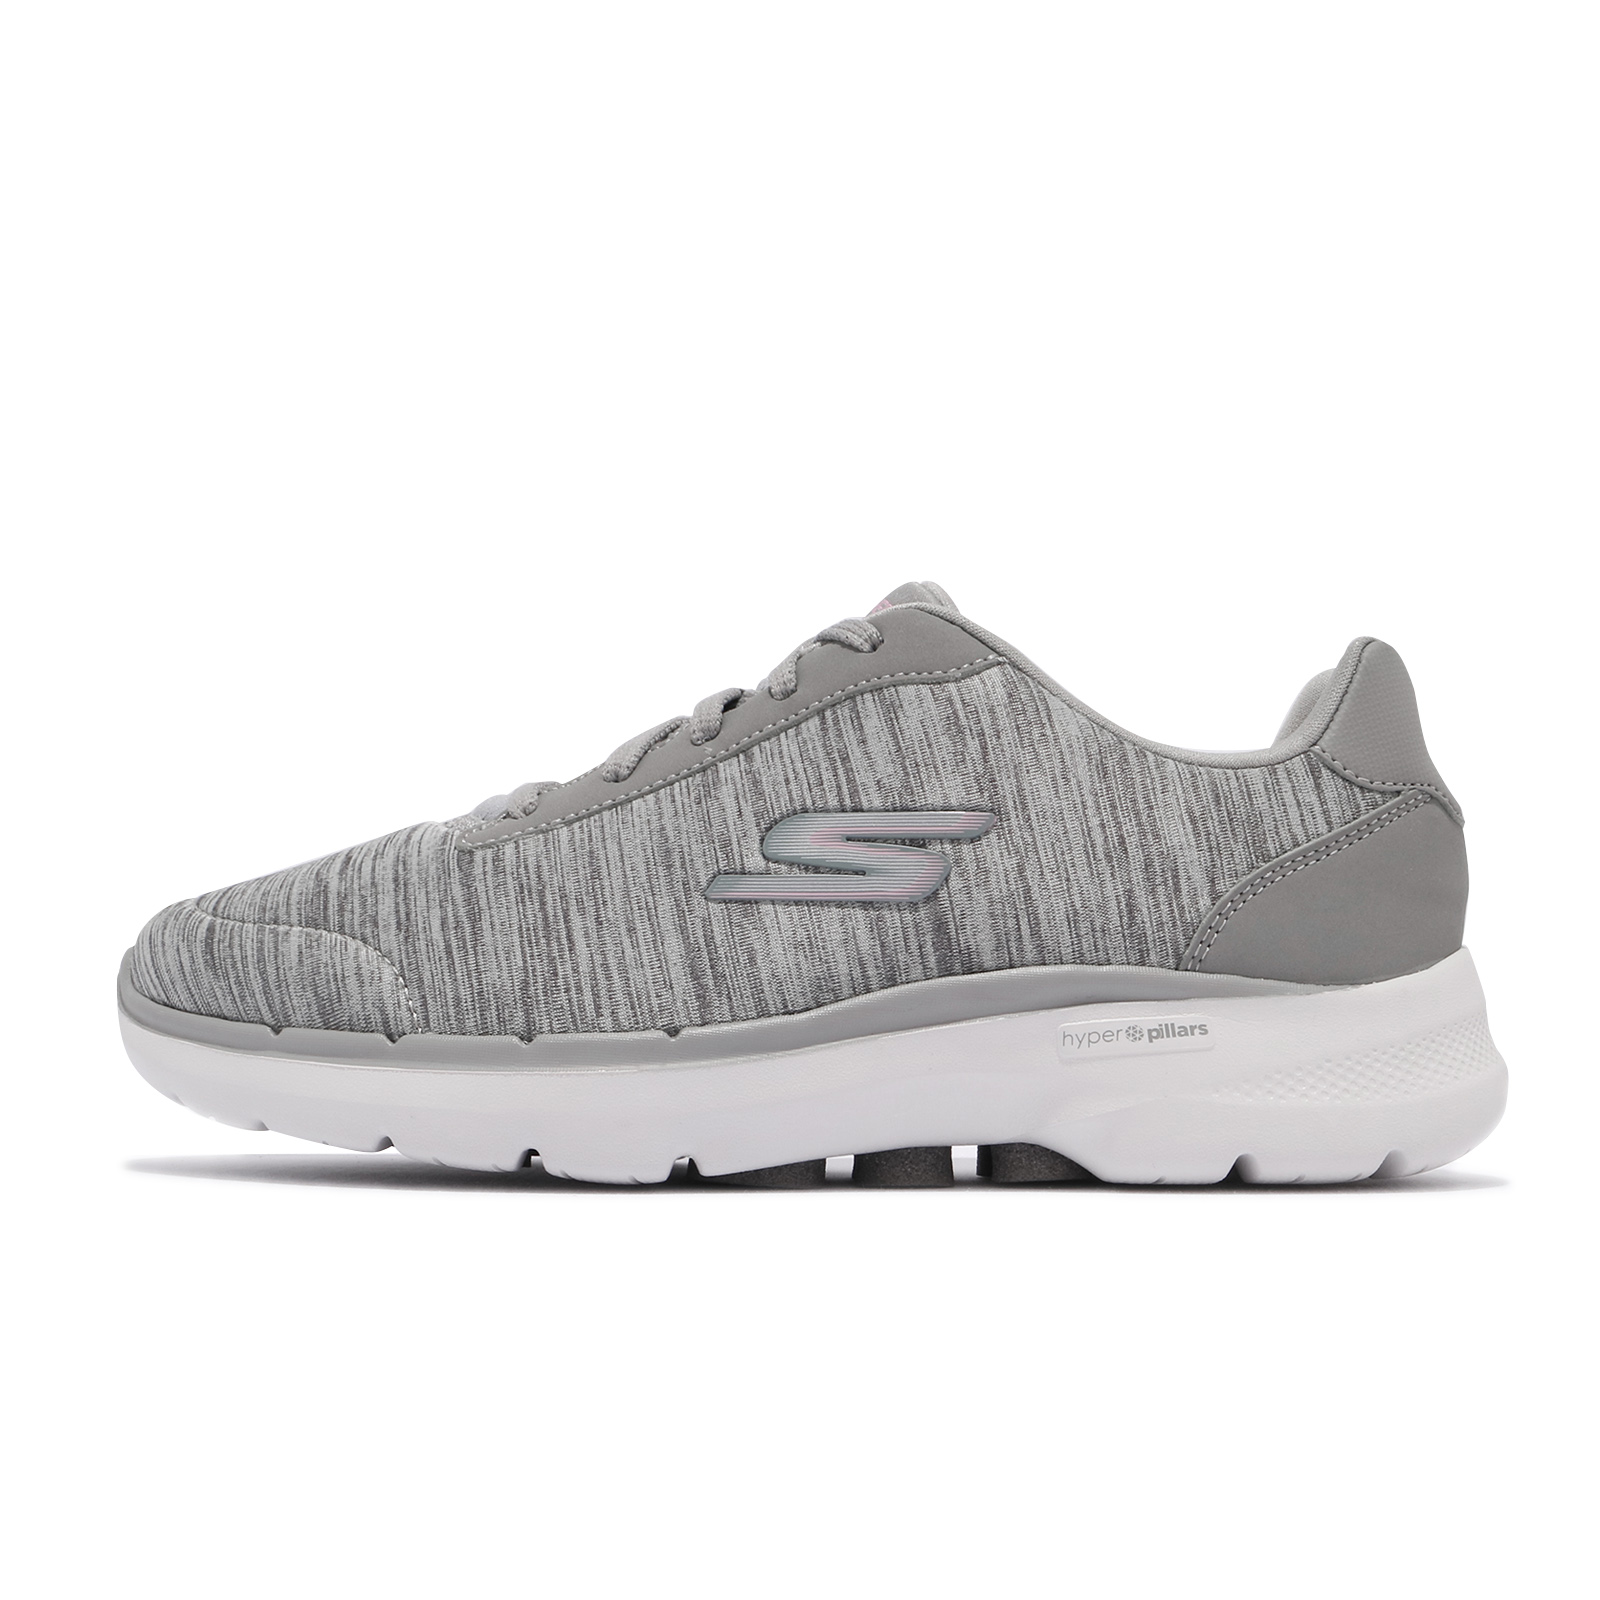 Skechers 健走鞋 Go Walk 6 寬楦頭 女鞋 灰 白 記憶鞋墊【ACS】 124506W-GRY